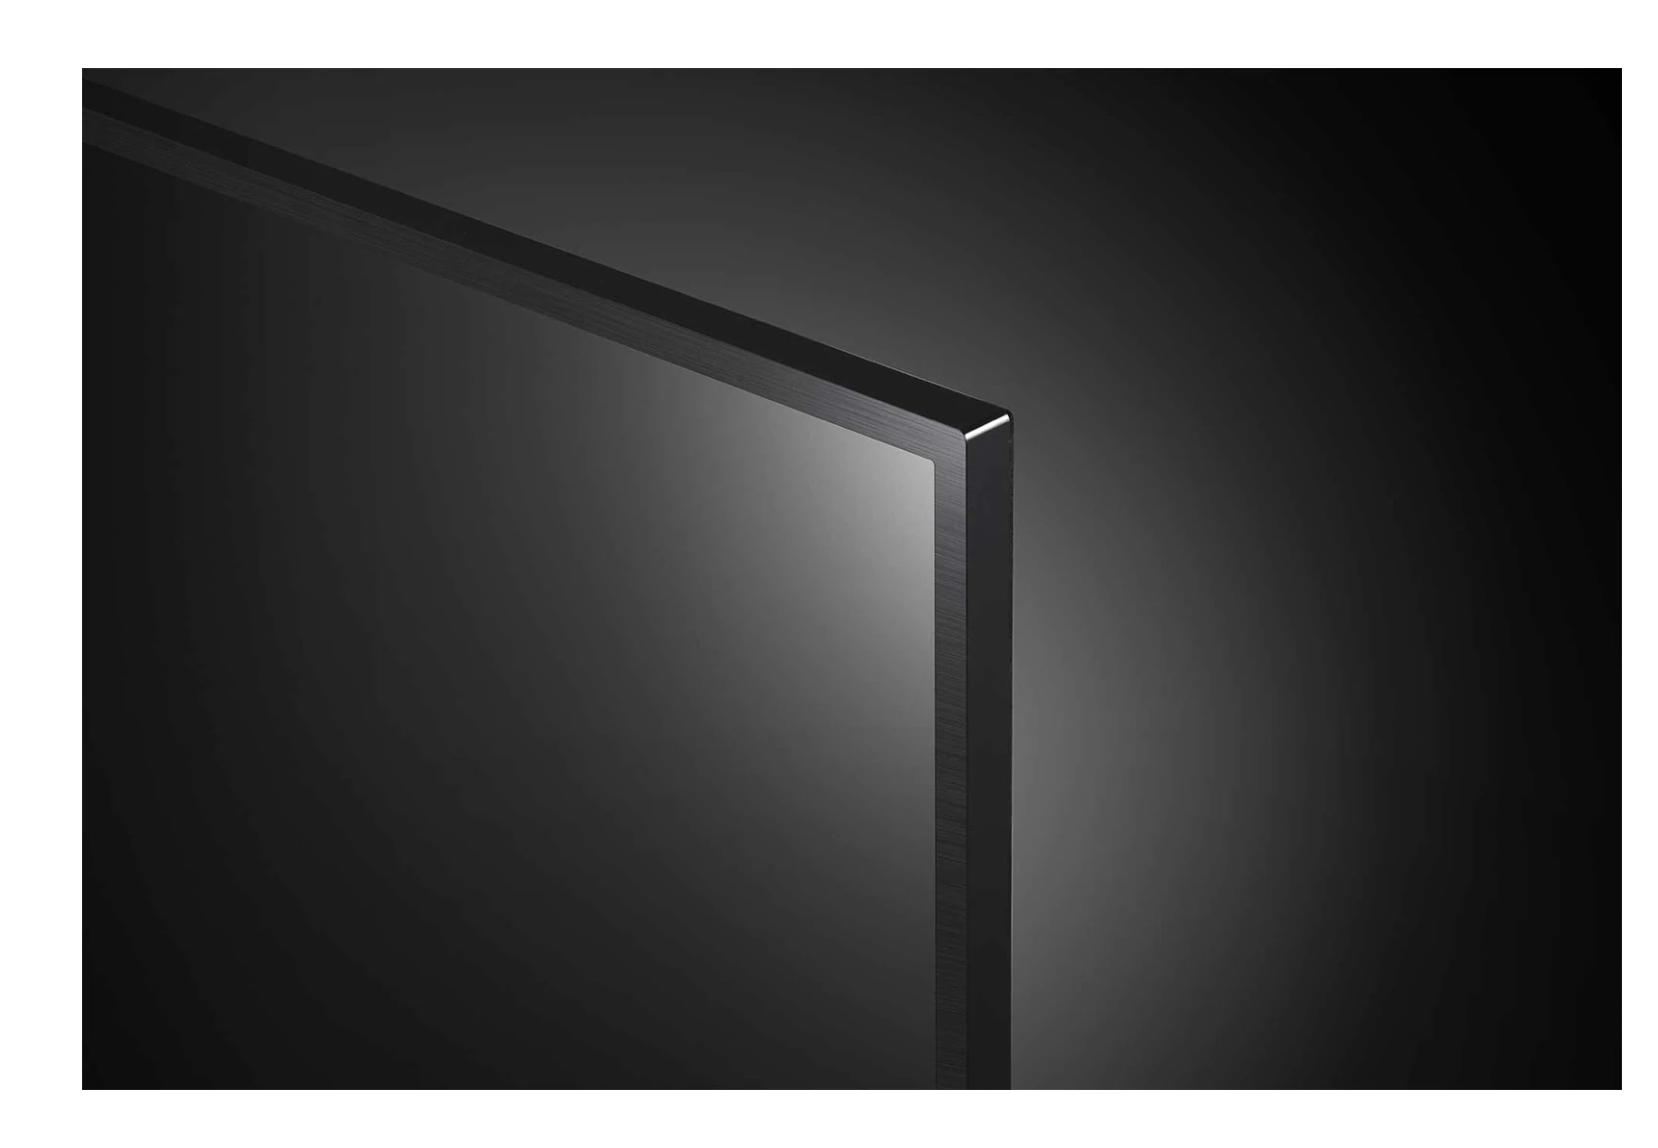 LG LED 43 inch, 43UN7340 Smart 4K TV Tanzania  (EGYPT Made)